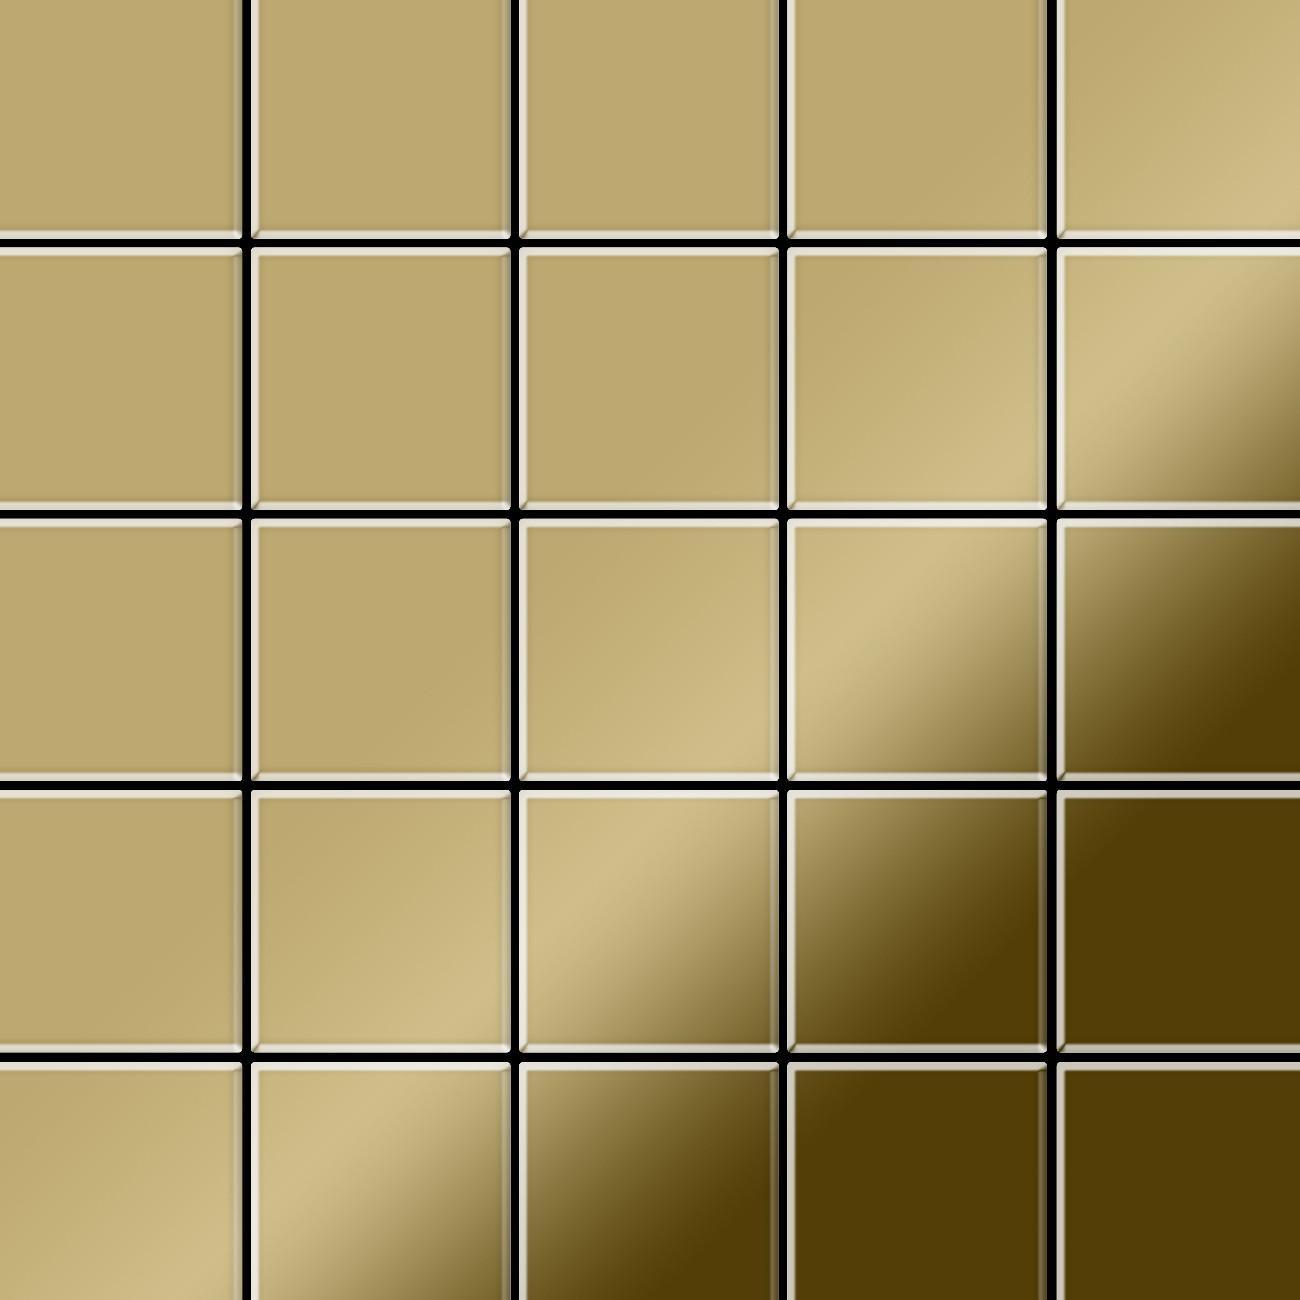 mosaik fliese massiv metall titan hochgl nzend in gold 1 6mm stark alloy century ti gm 0 5 m2. Black Bedroom Furniture Sets. Home Design Ideas